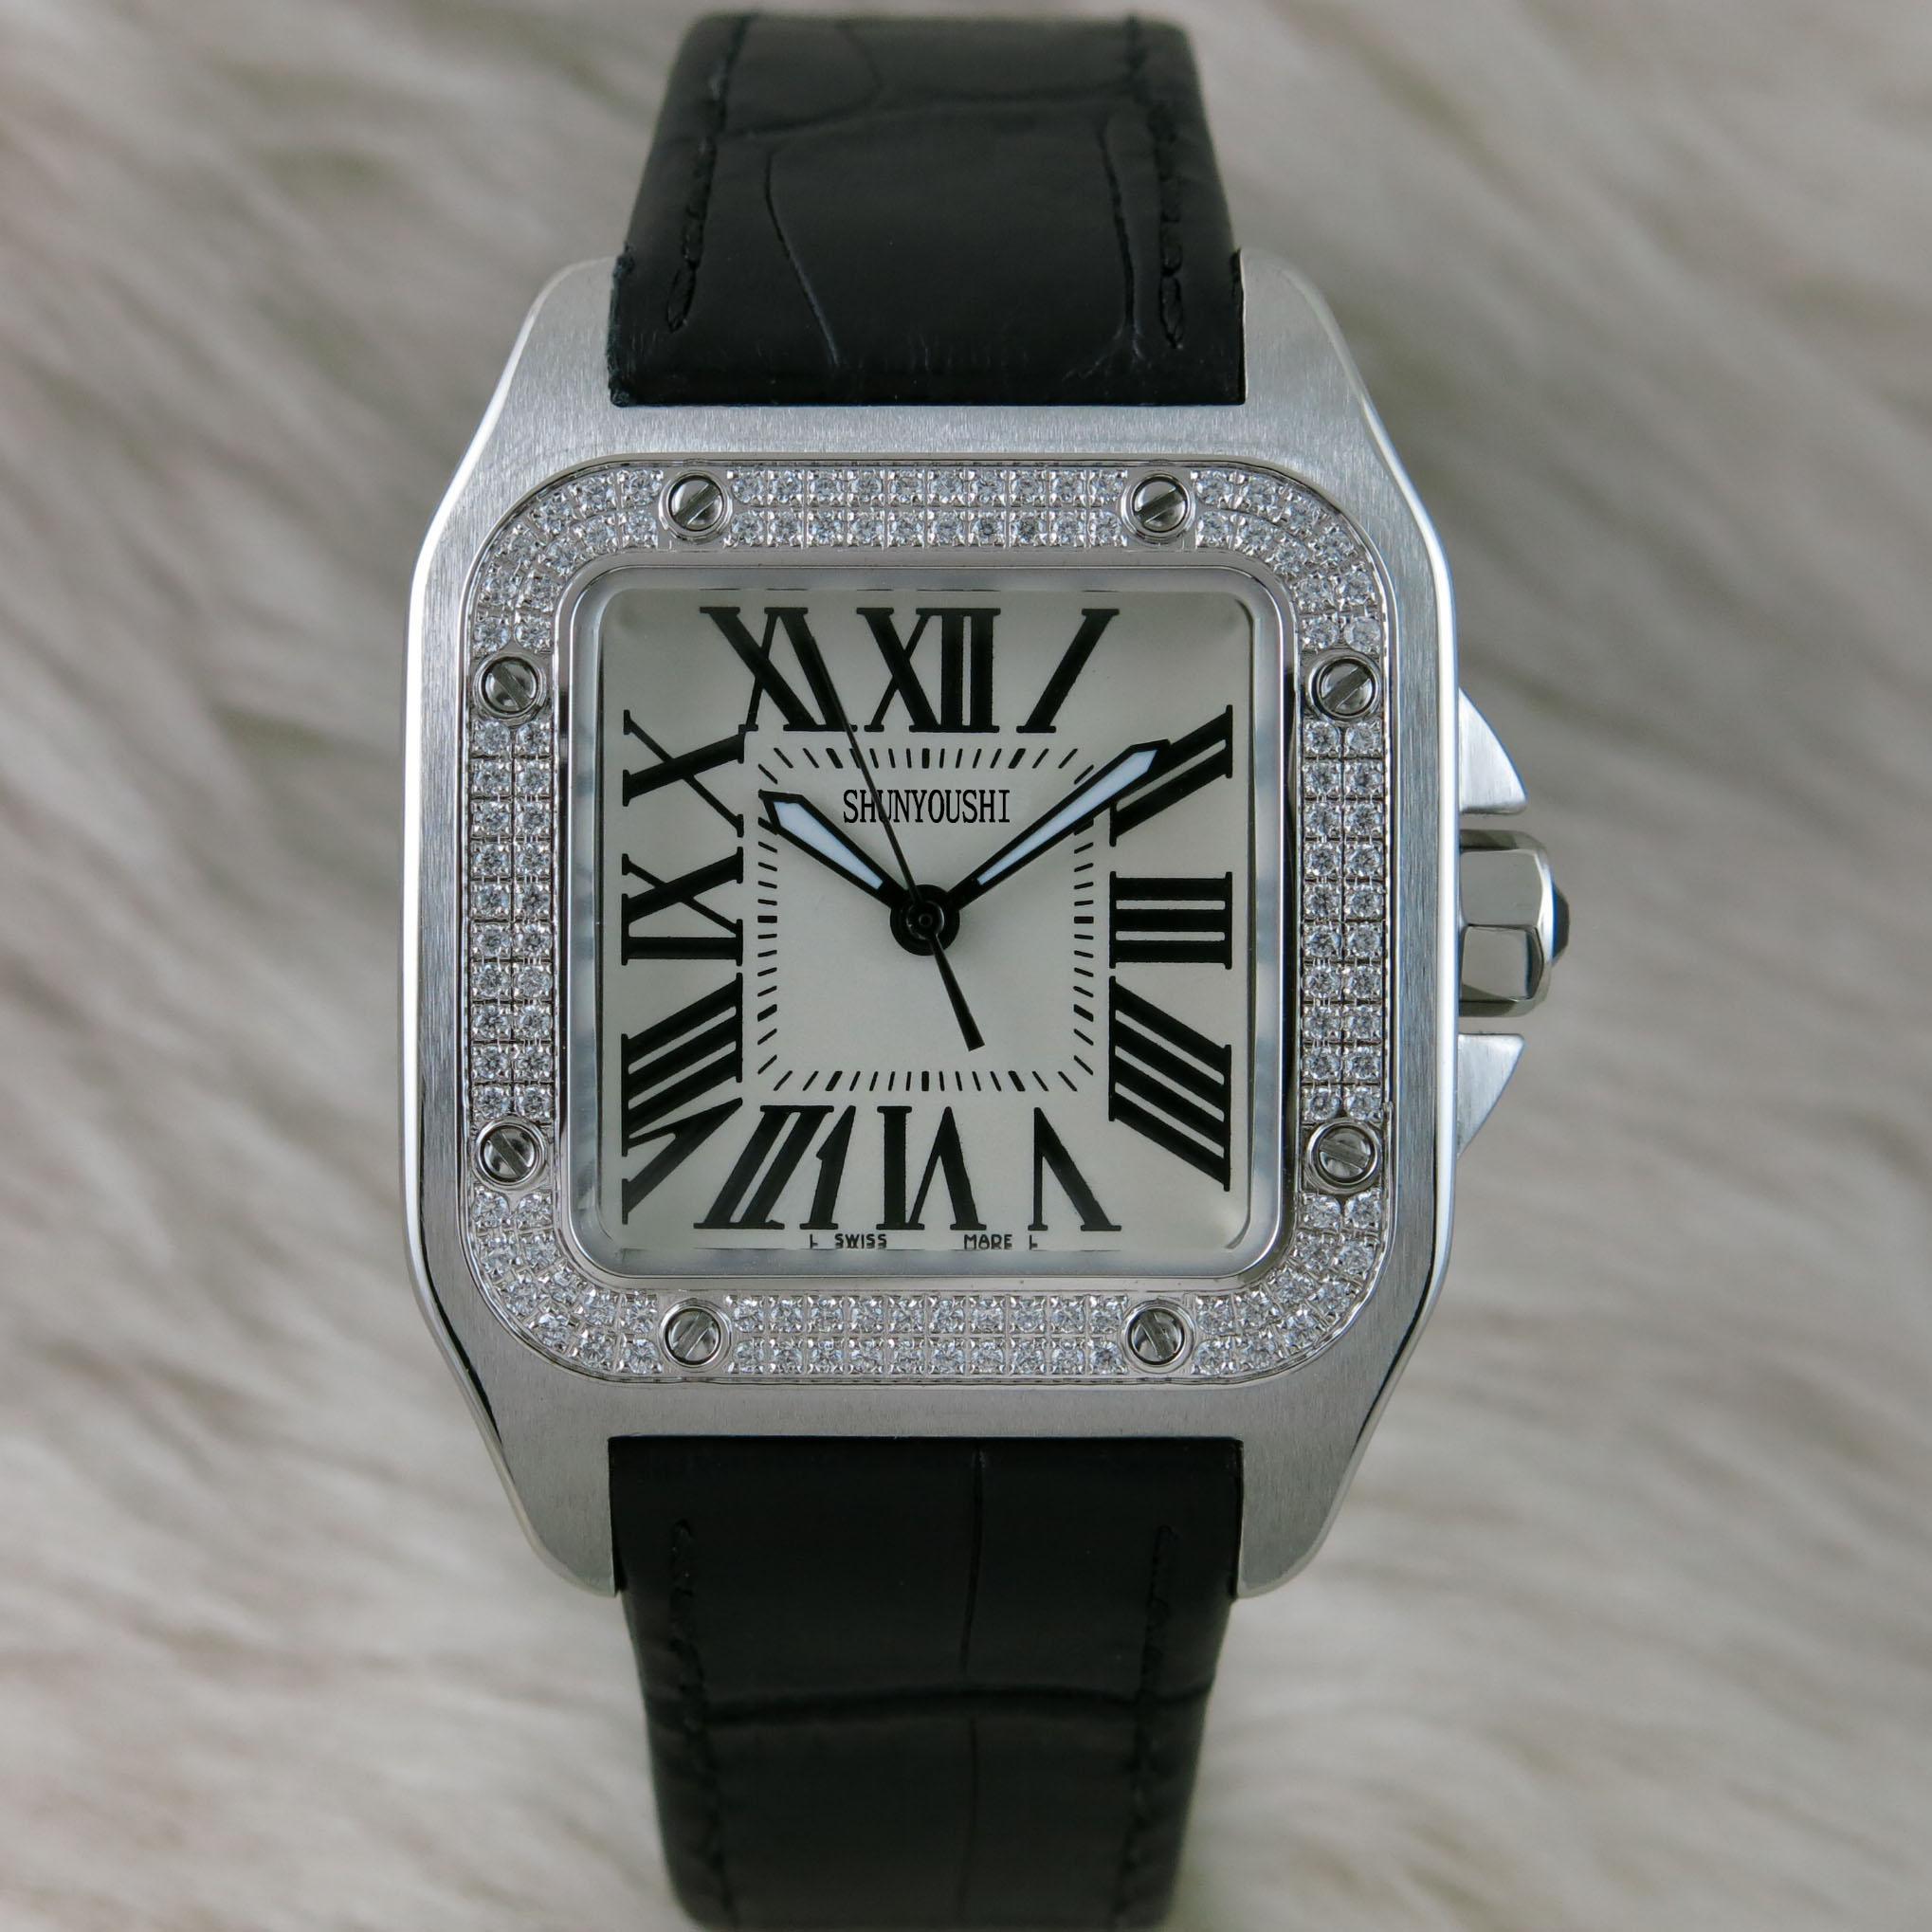 WG05356    Womens Watches Top Brand Runway Luxury European Design  Quartz WristwatchesWG05356    Womens Watches Top Brand Runway Luxury European Design  Quartz Wristwatches